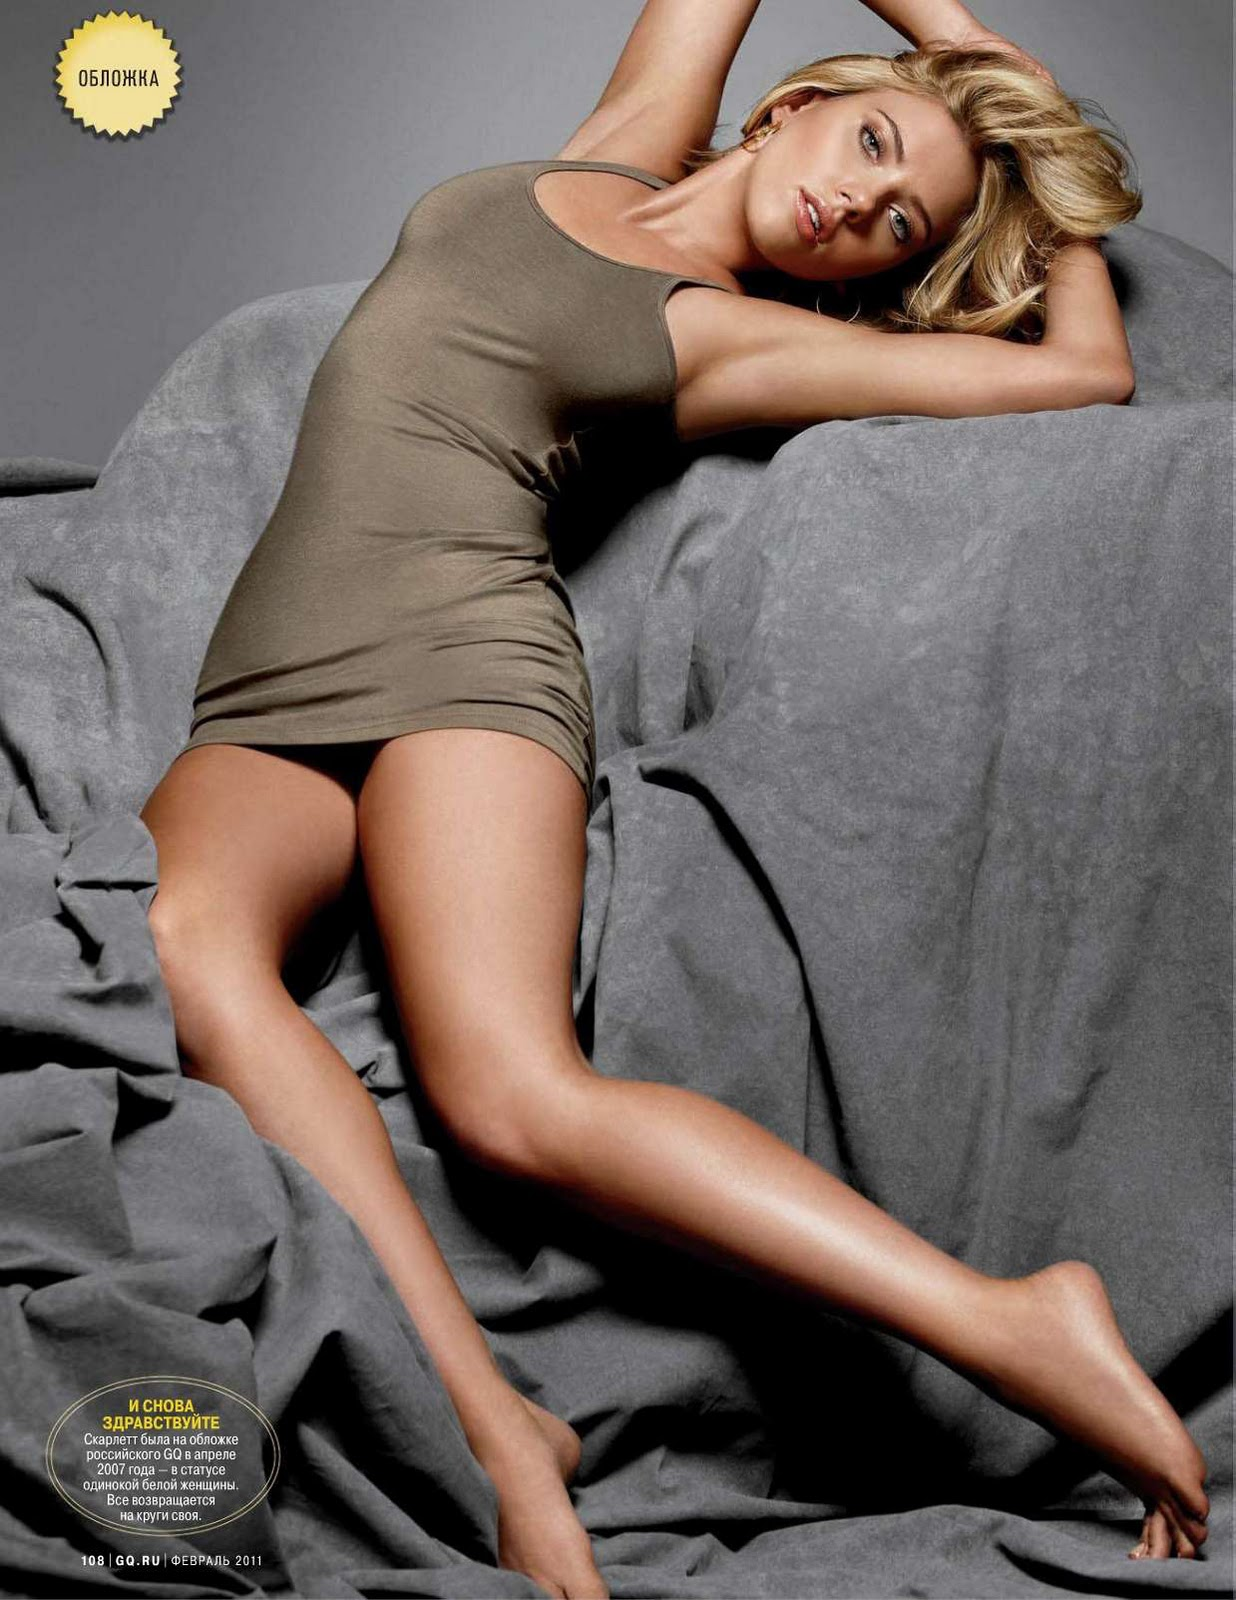 http://4.bp.blogspot.com/_8bh00i14aFQ/TTrakHC650I/AAAAAAAABcs/kvPS5aba1uI/s1600/37040_Scarlett_Johansson_GQ_Russia_02_2011_02_123_19lo.jpg